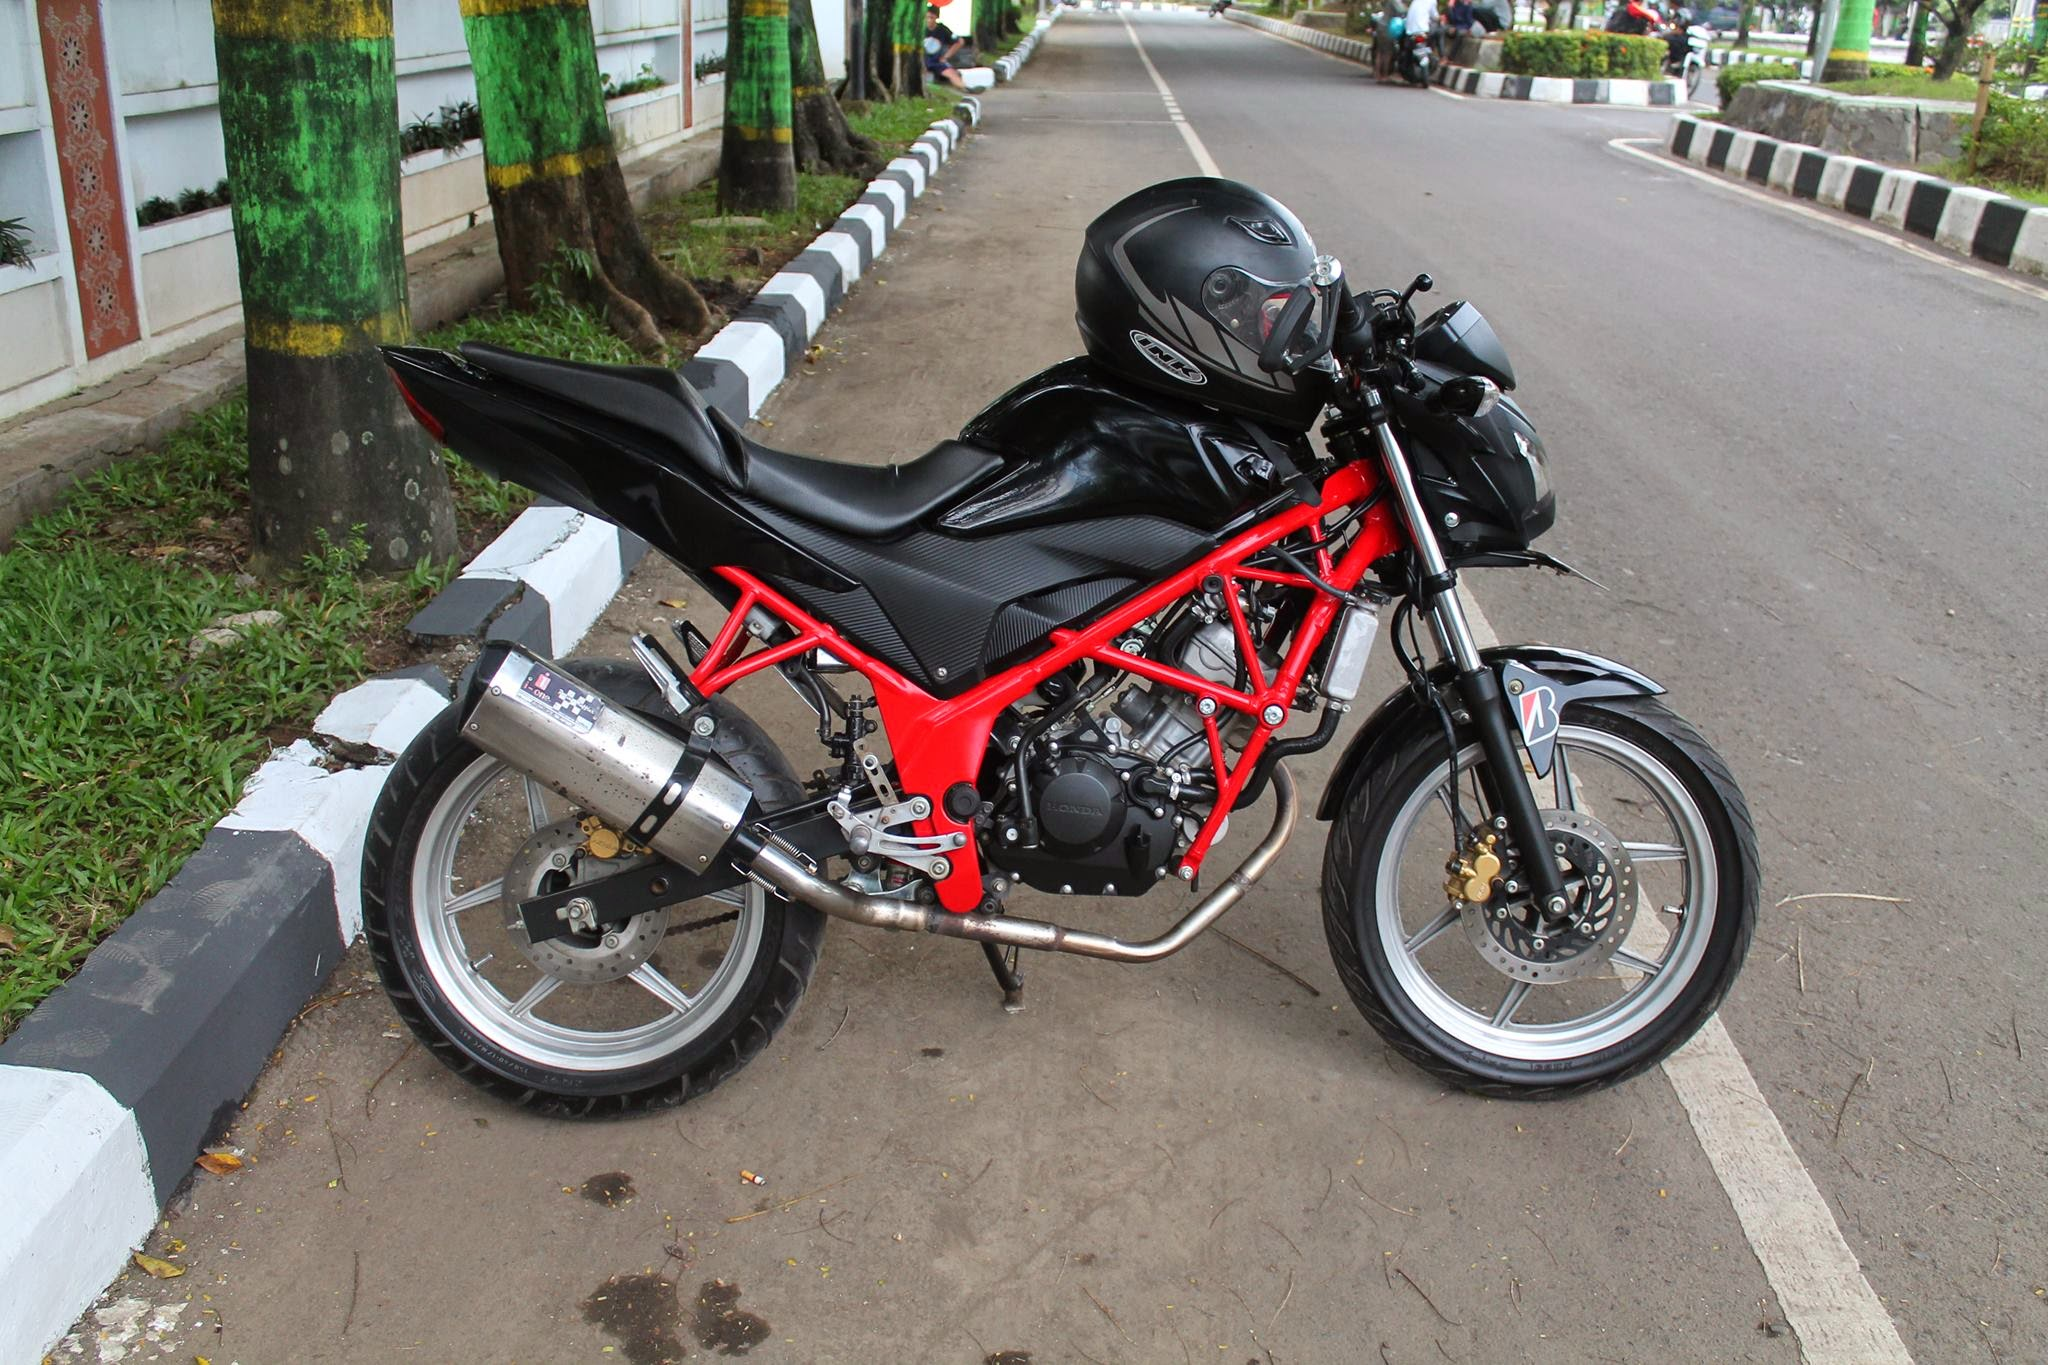 modifikasi new vixion street fighter minimalis - thecitycyclist ™